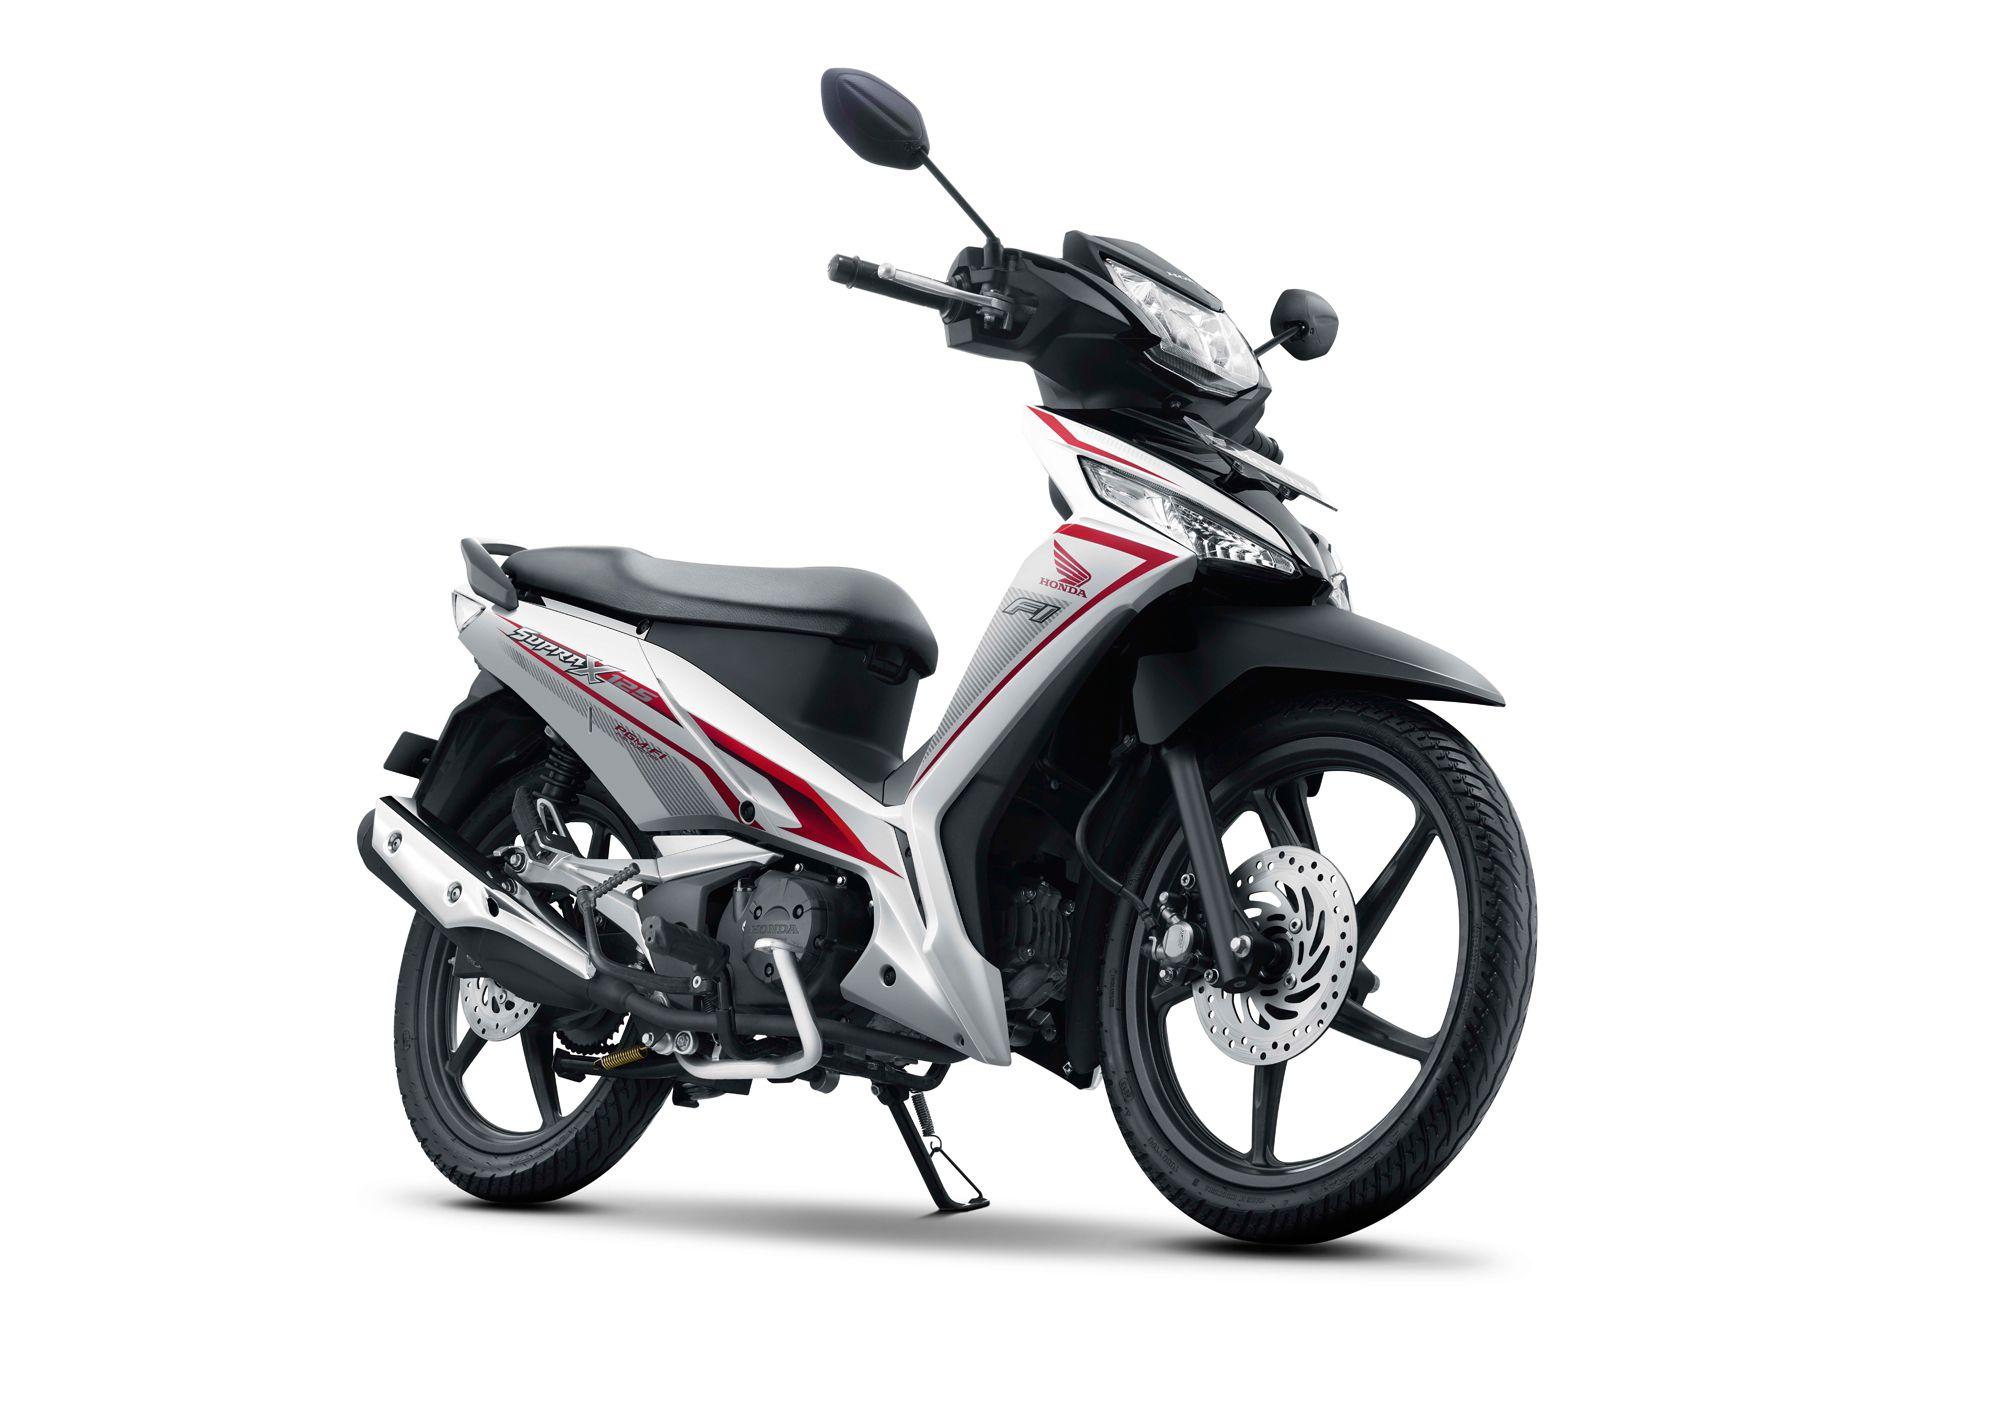 60 Modifikasi Motor Supra X 125 Bandung Terkeren Klobot Modifikasi